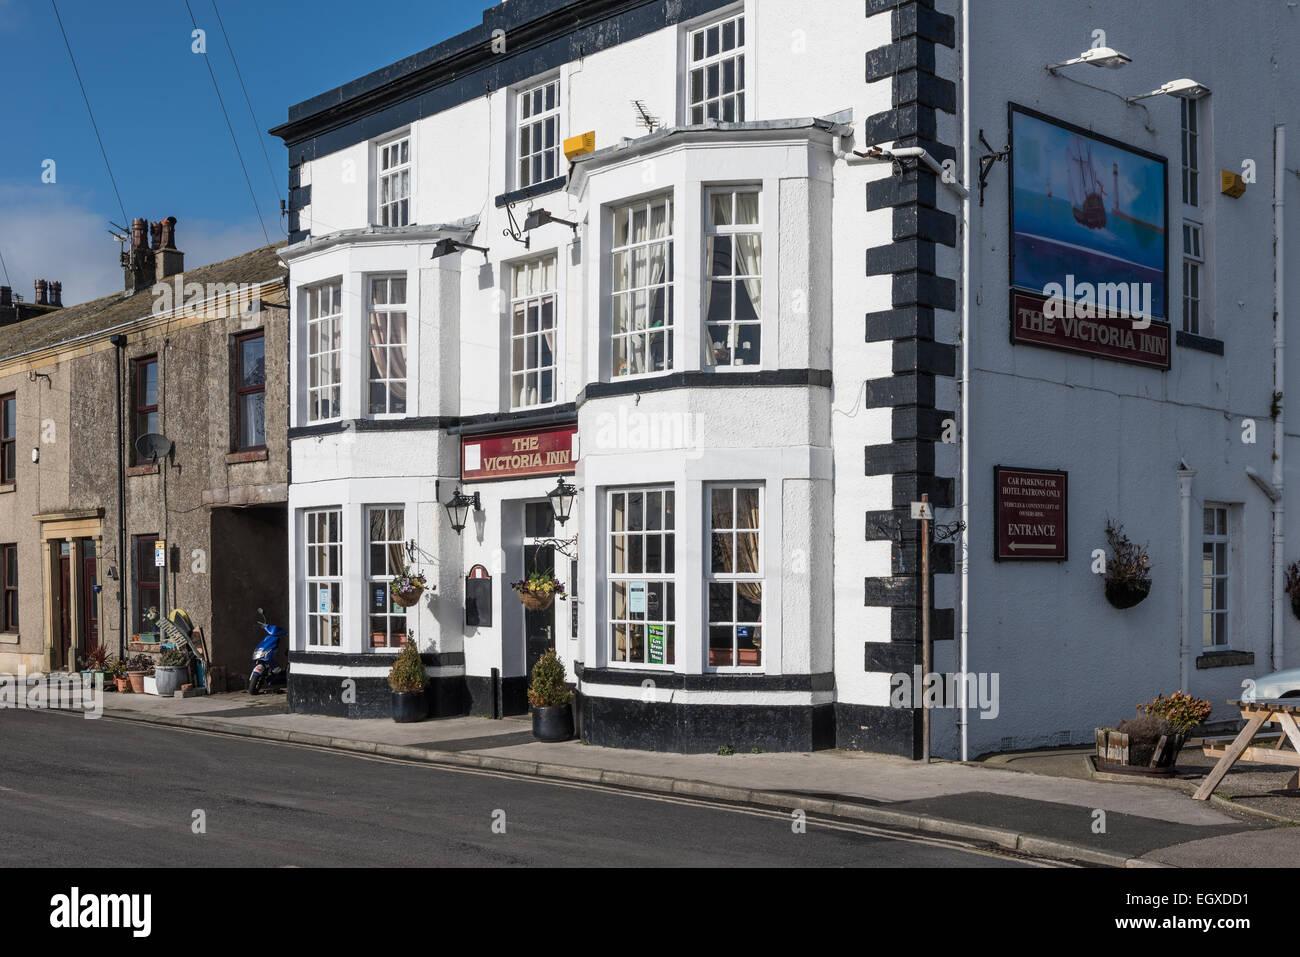 The Victoria Inn at Glasson Dock Loancashire - Stock Image